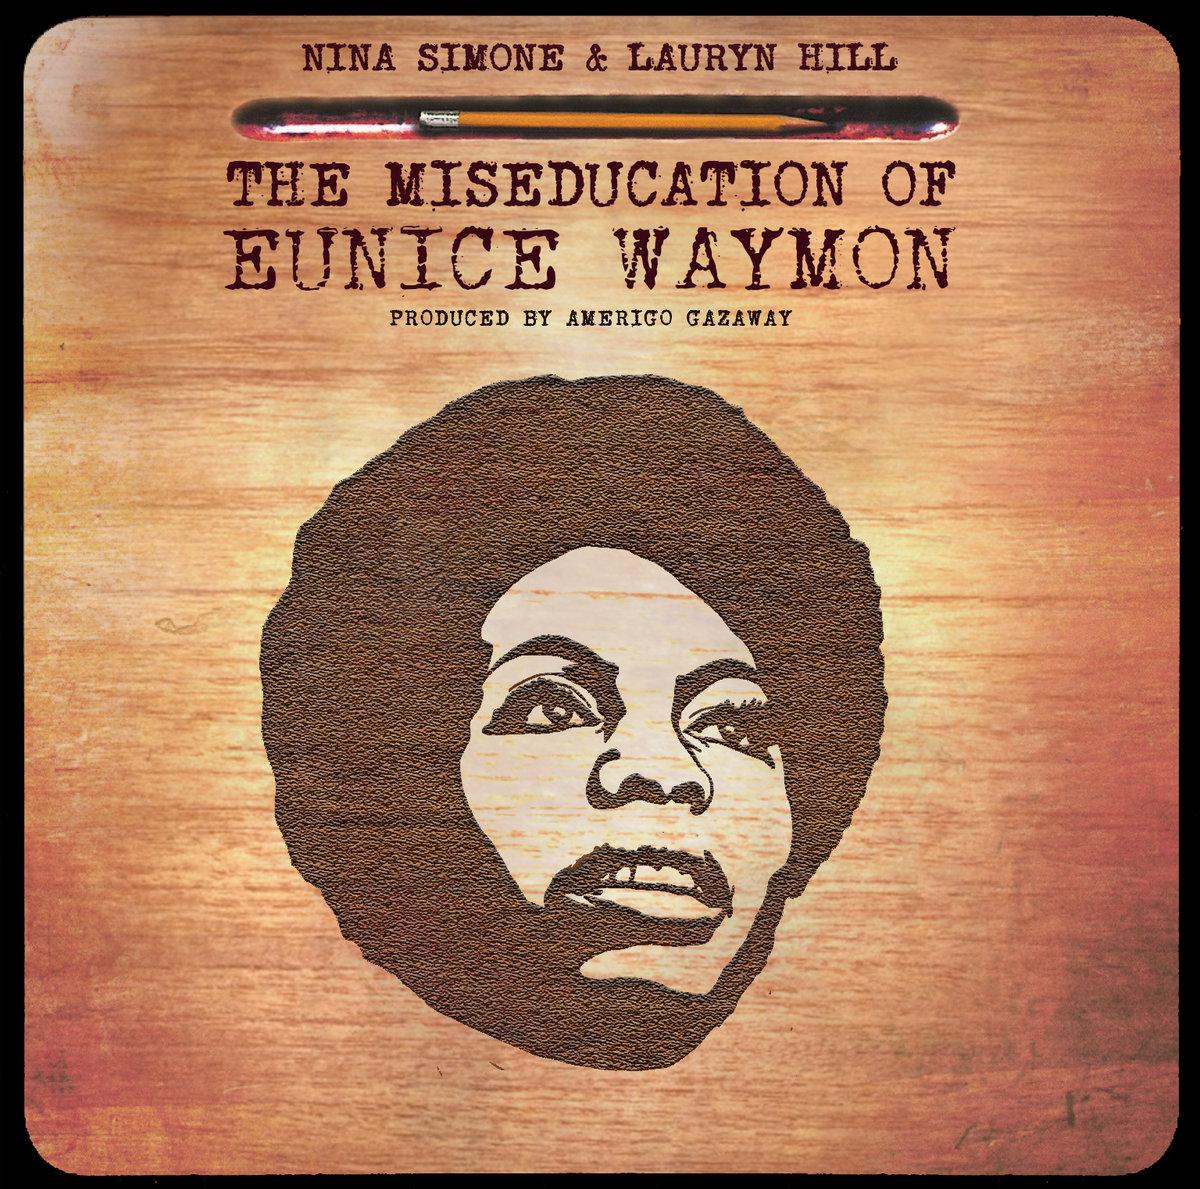 Lauryn Hill_Nina Simone